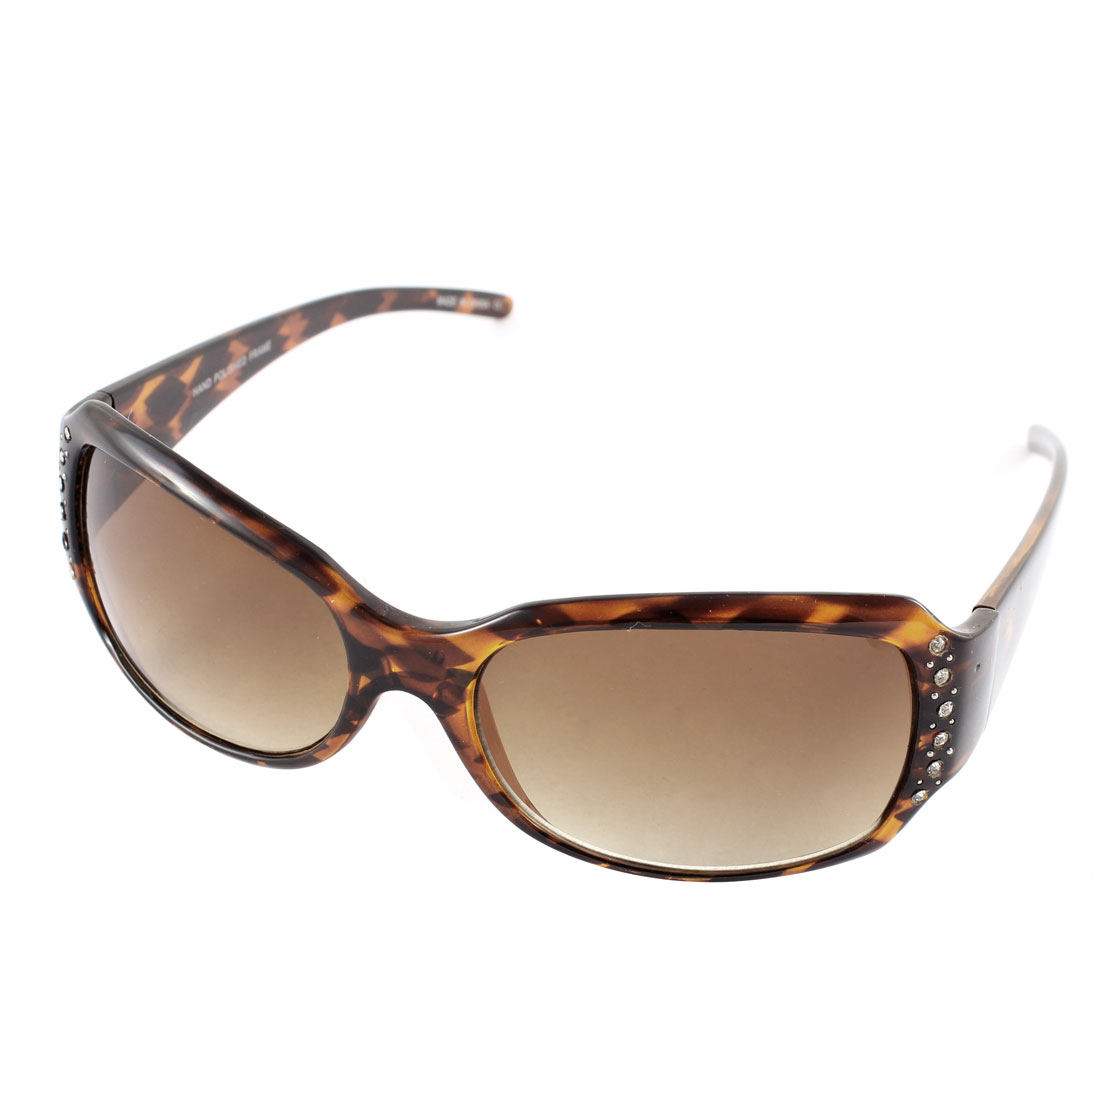 Lady Retro Style Rhinestone Decor Protection Sunglasses Eyewear Brown